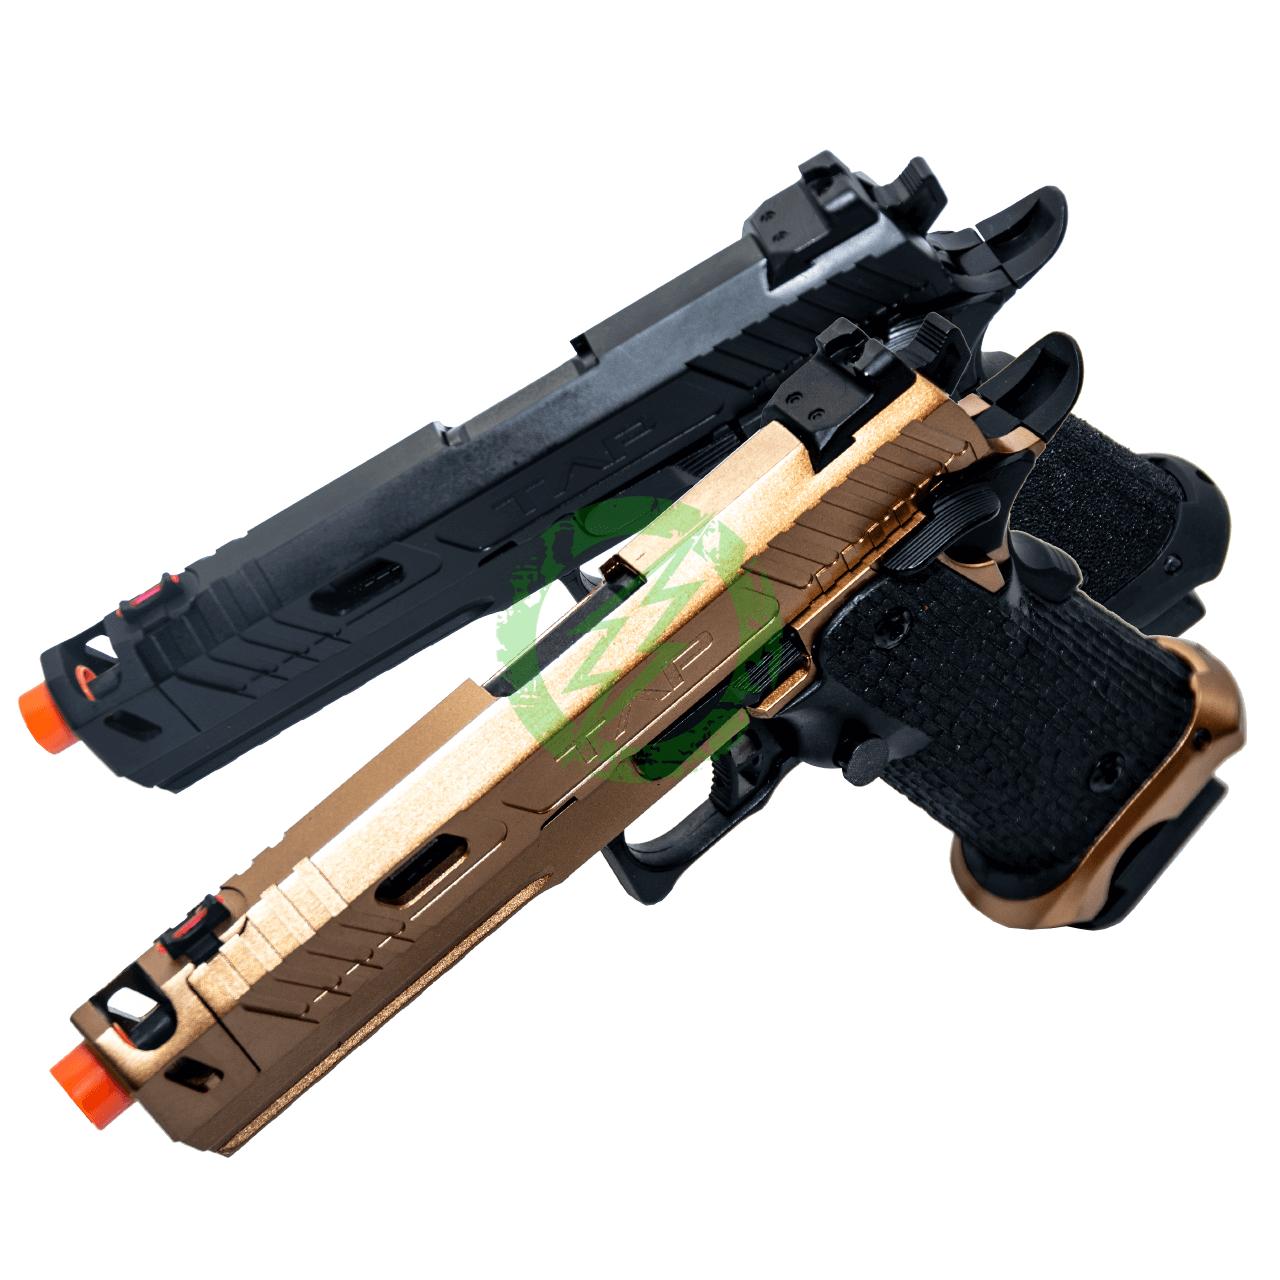 ECHO 1 TAP Gas Blow Back Pistol | Bronze & Black